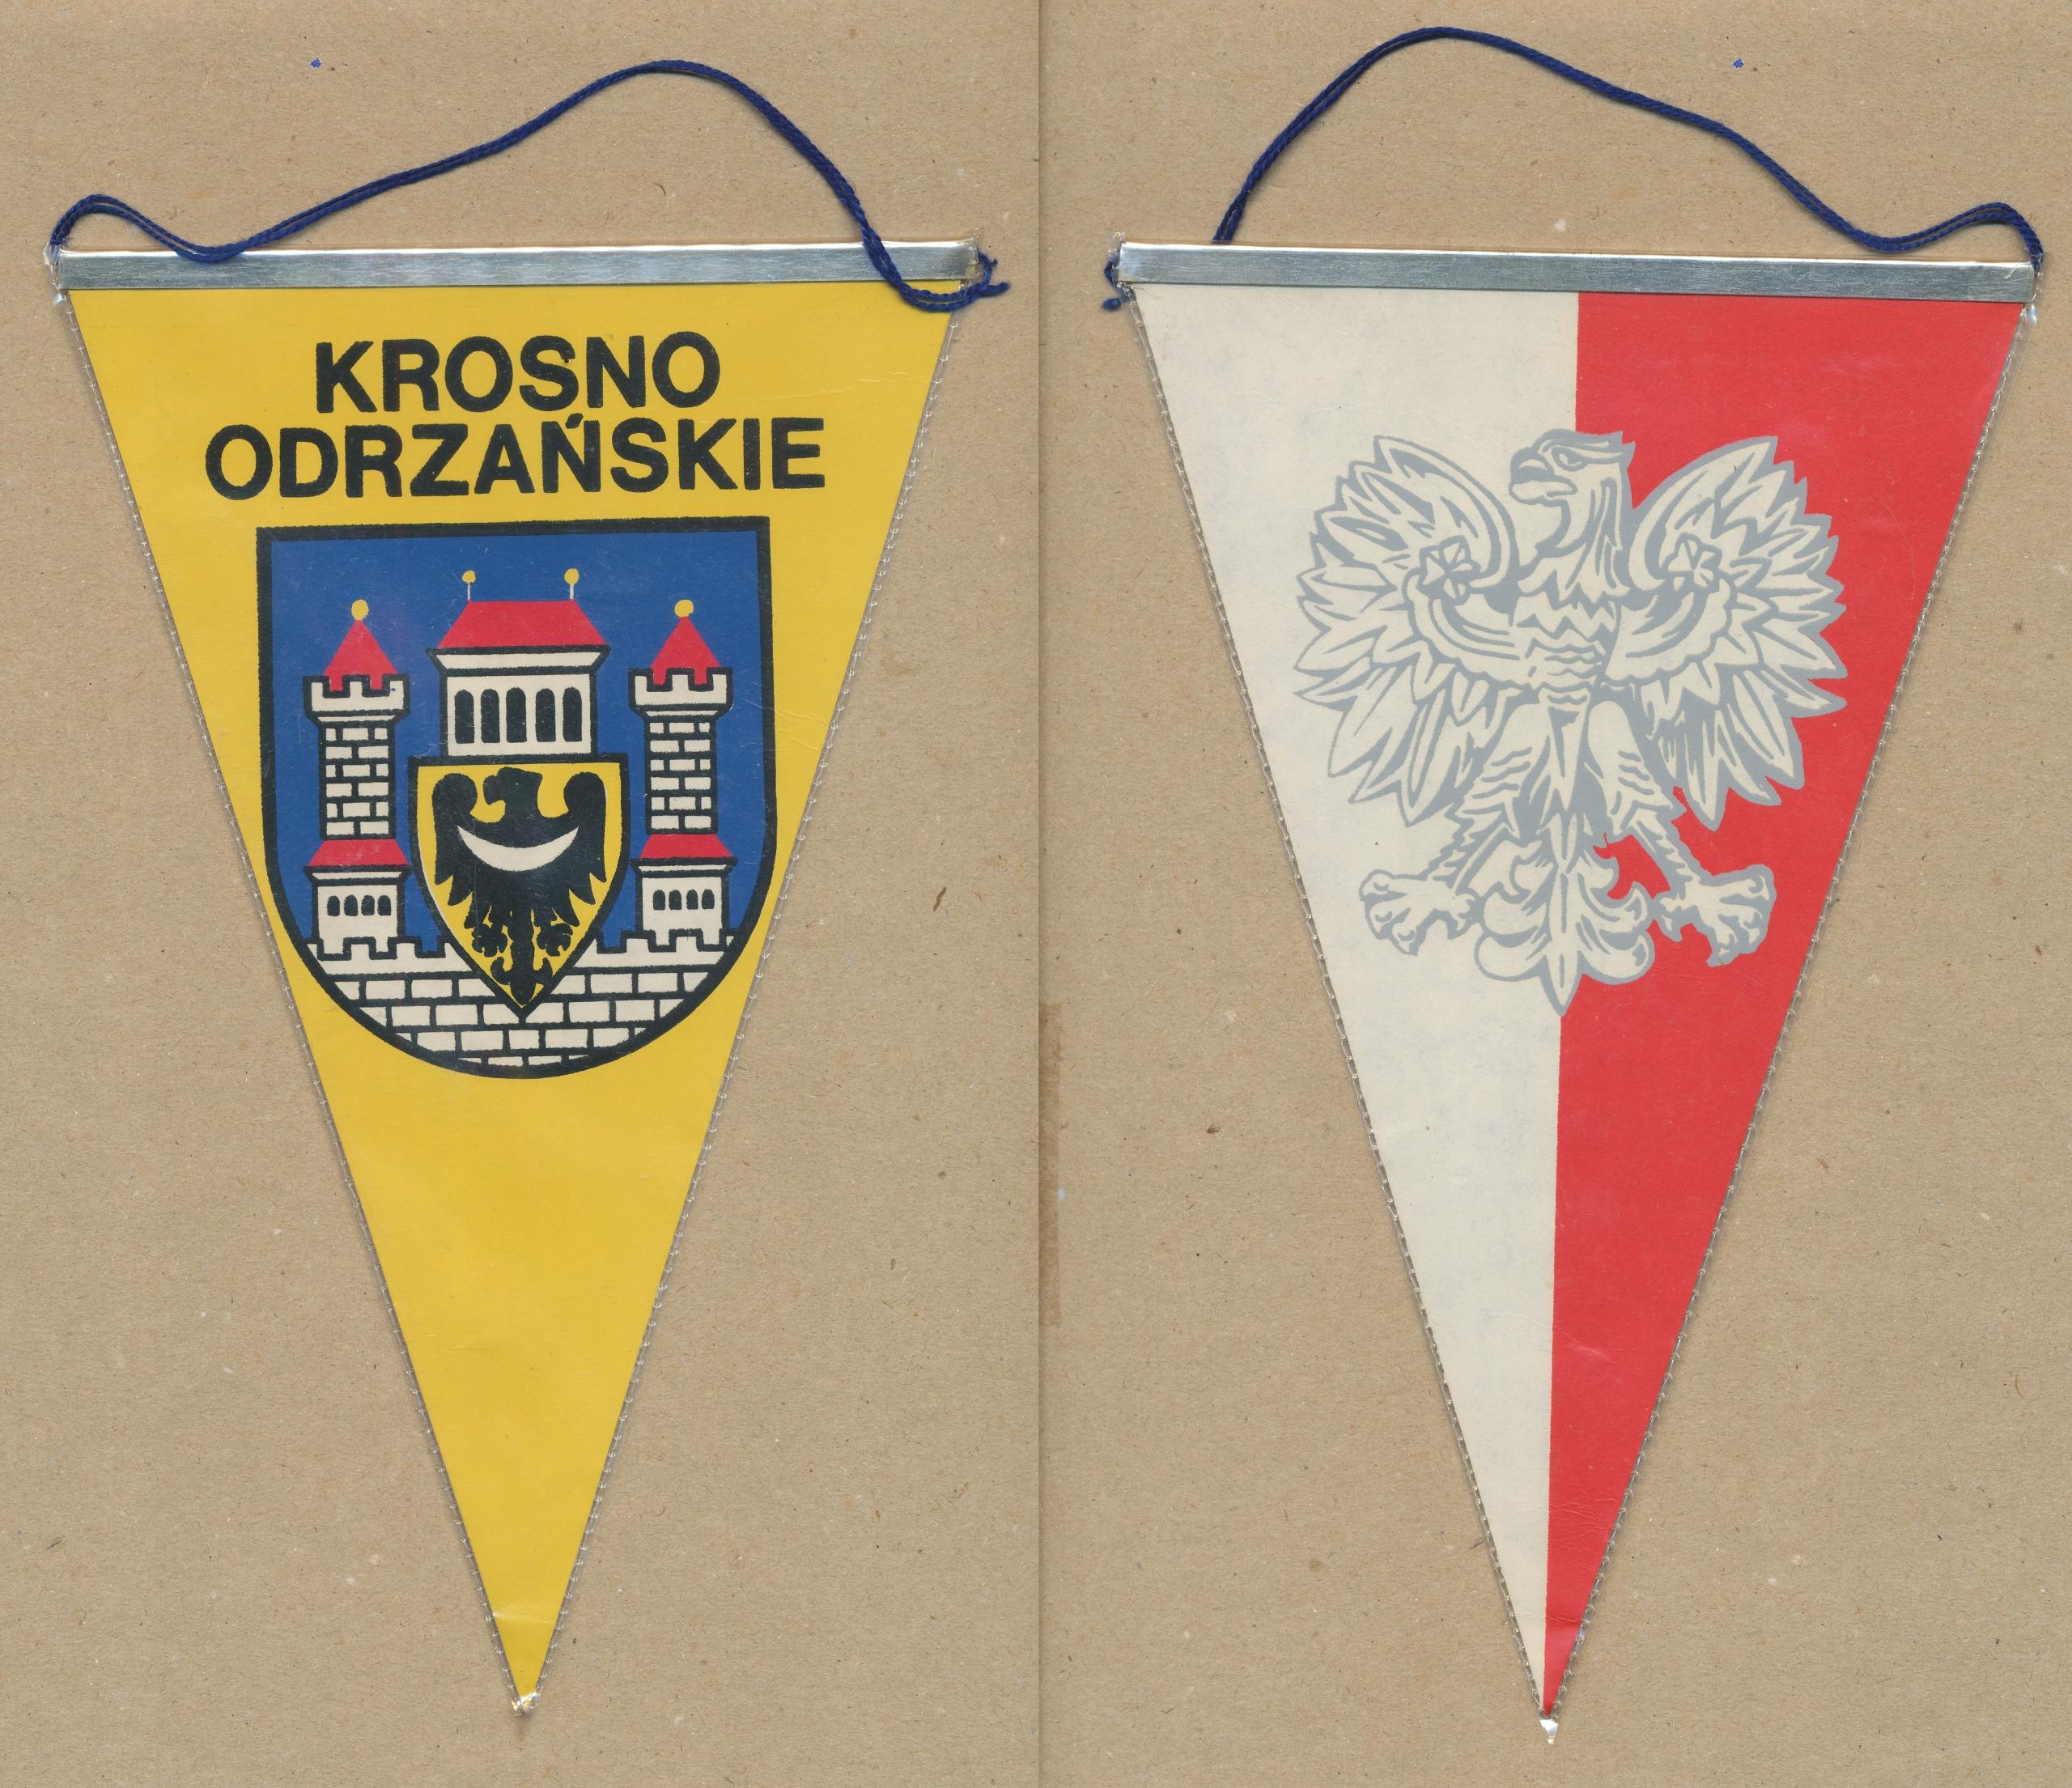 PROPORCZYK KROSNO ODRZAŃSKIE герб Польской Народной Республики